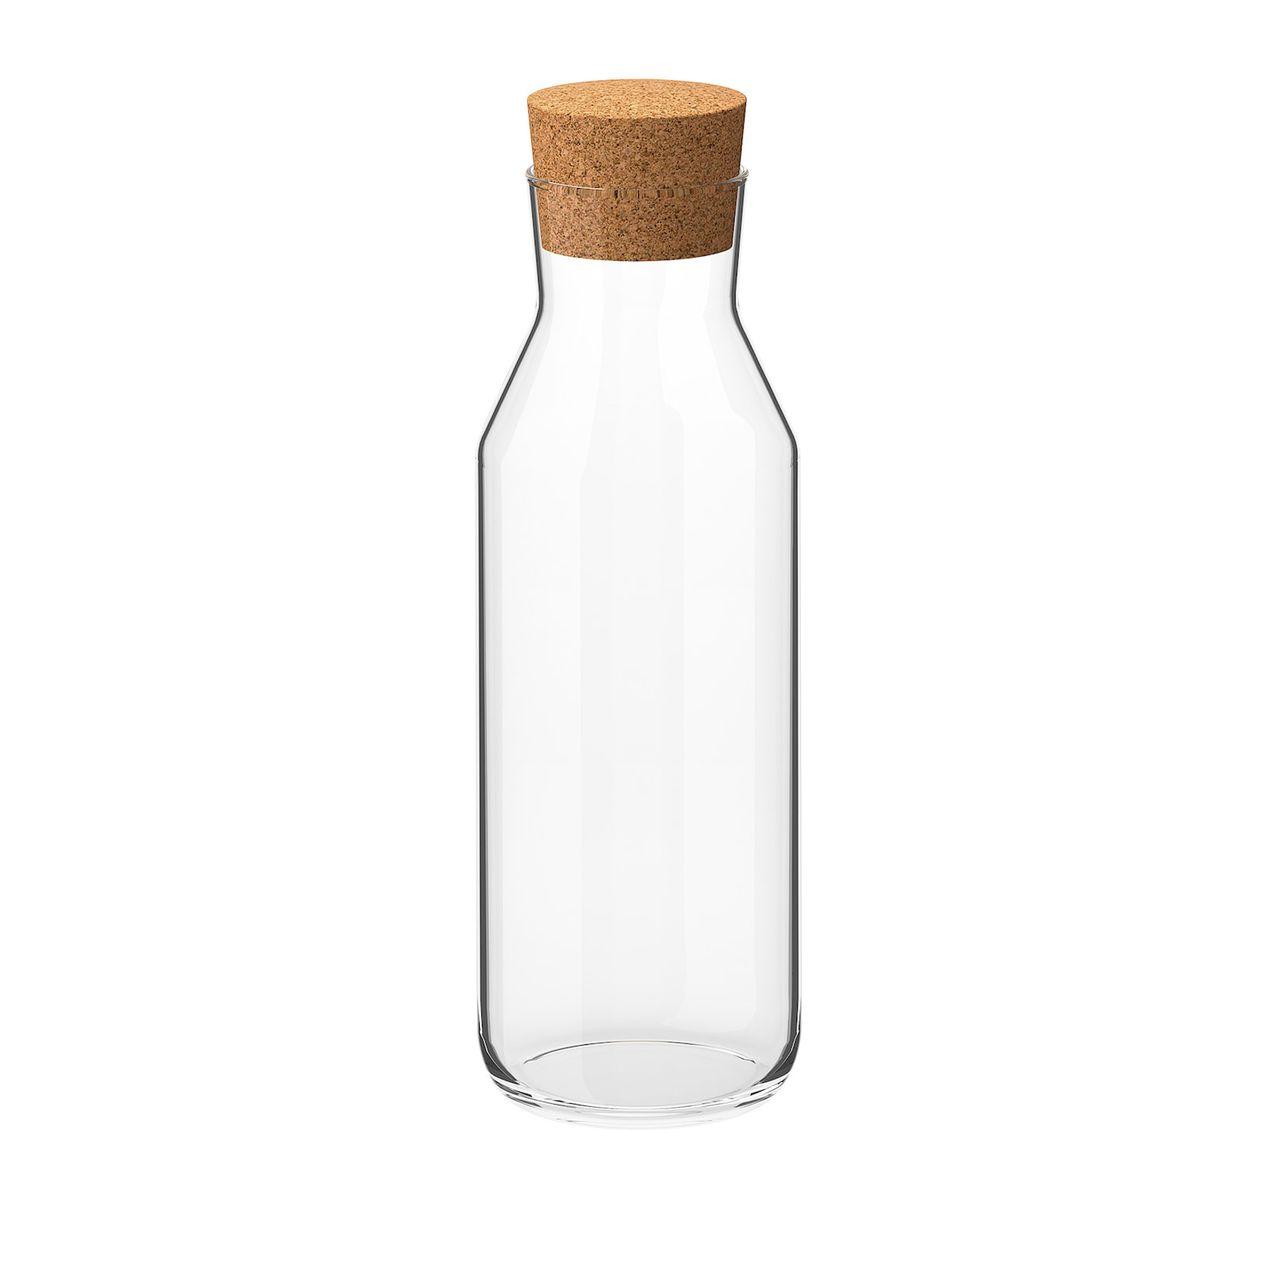 بطری آب بیتلی کد 356